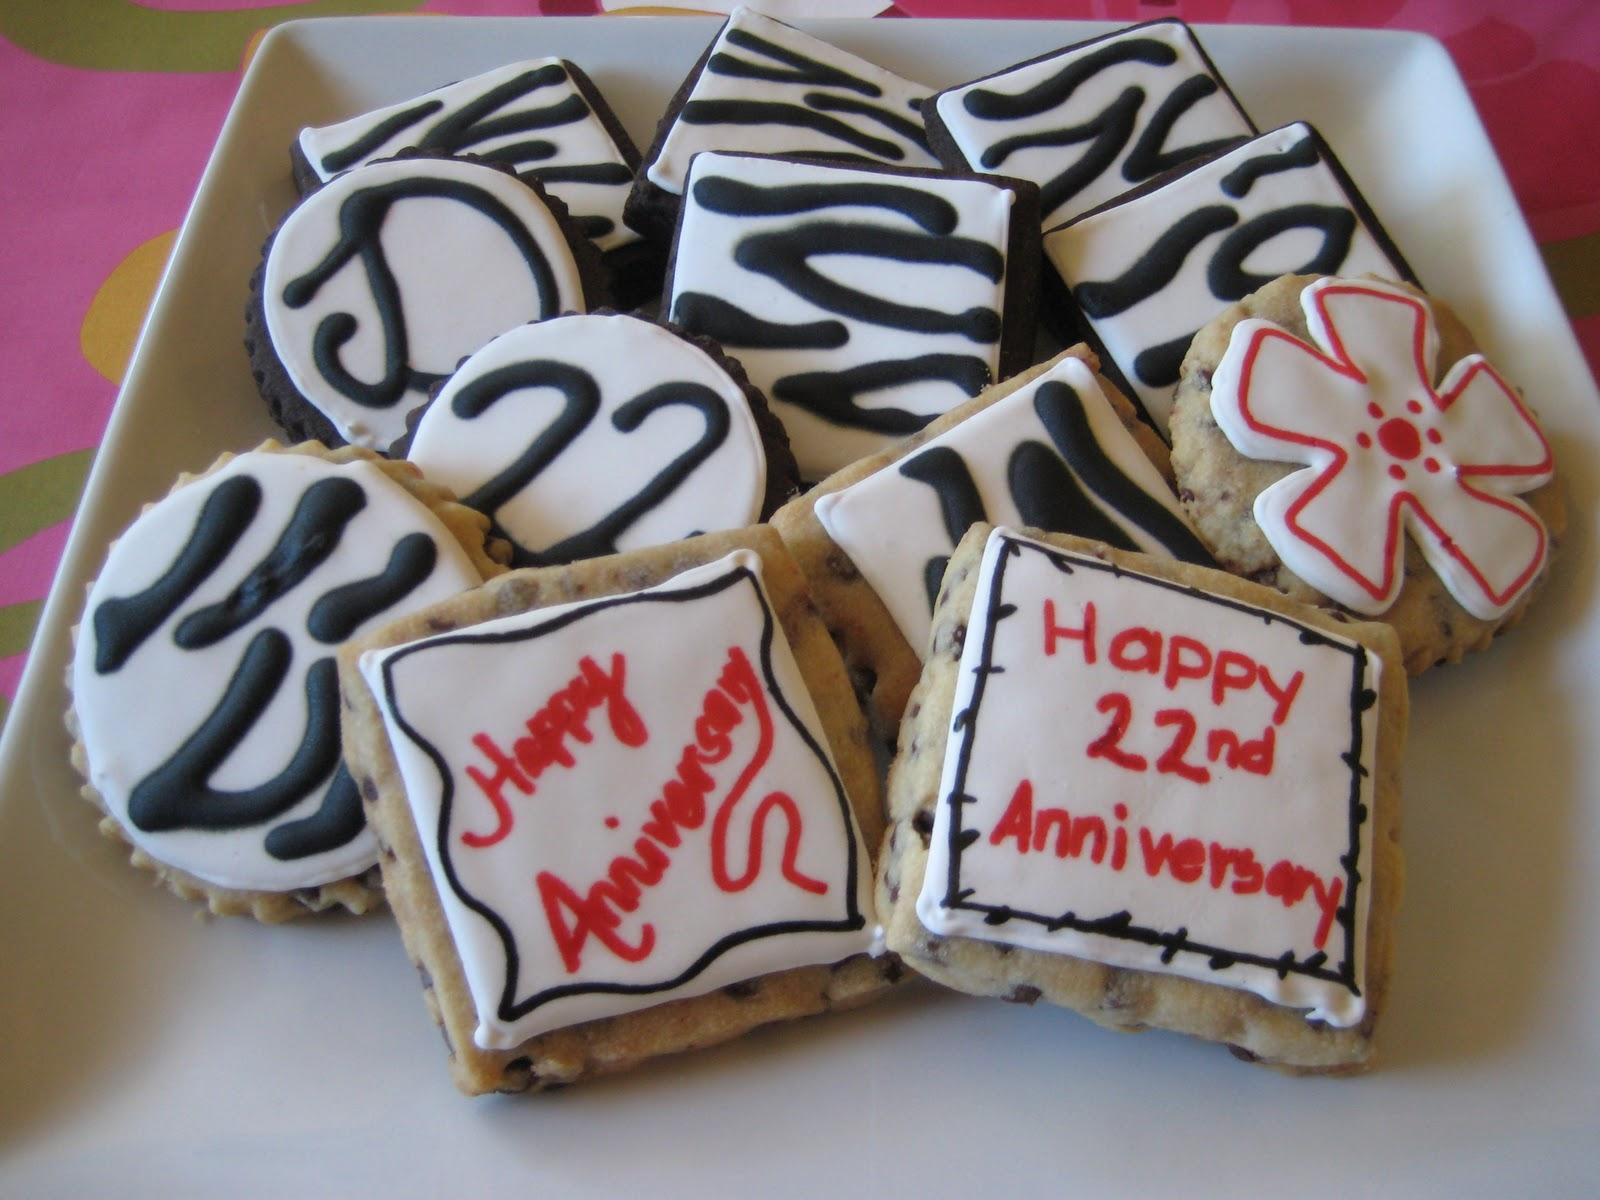 22nd Wedding Anniversary Gift Ideas: SugarHI Creations: Happy 22nd Anniversary